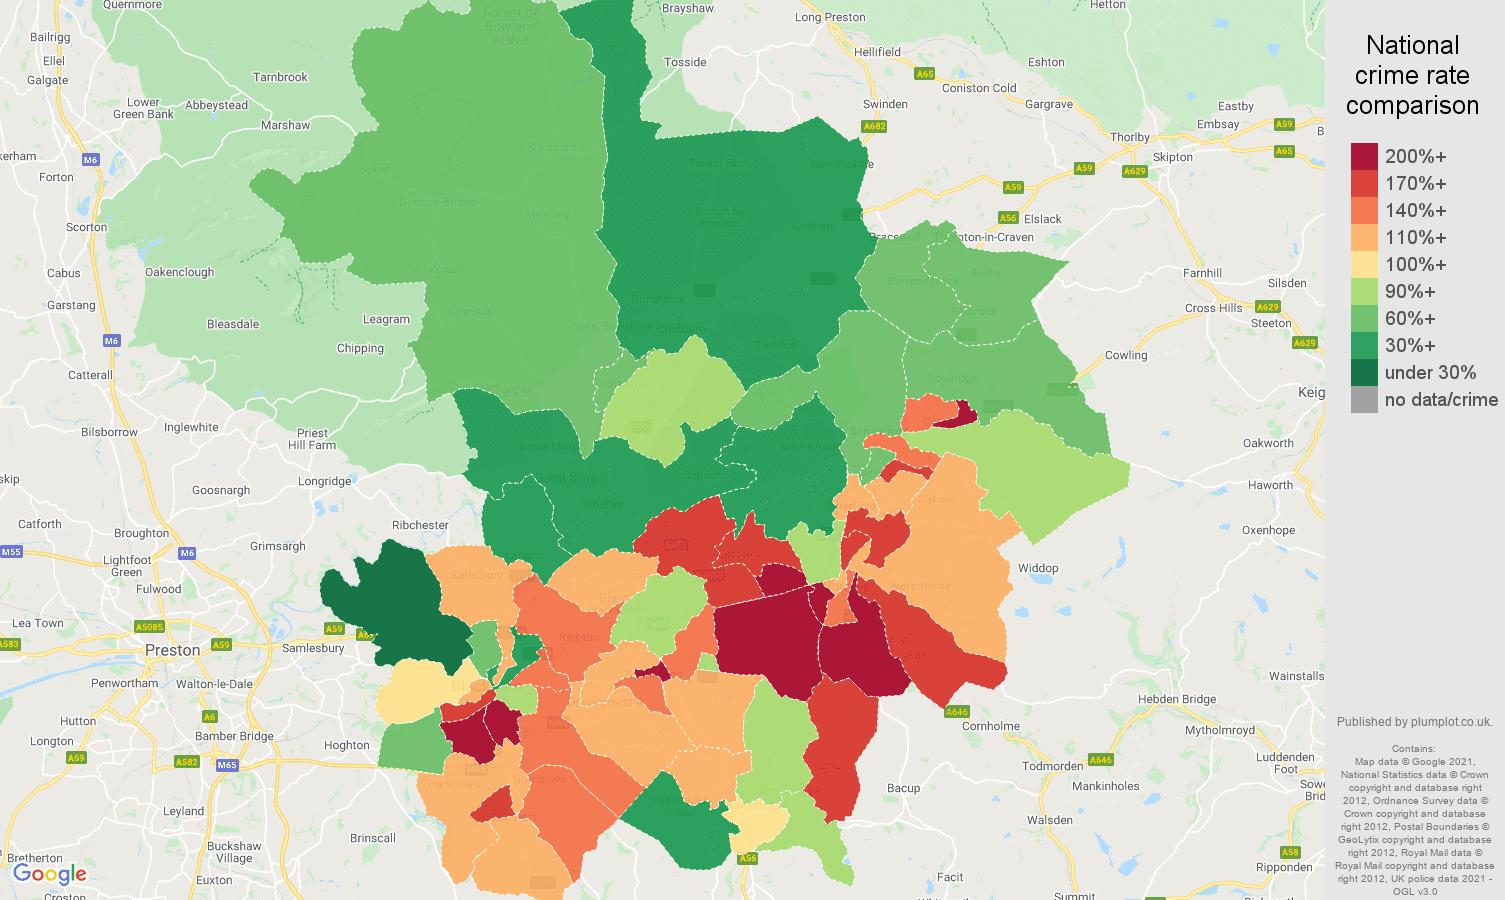 Blackburn criminal damage and arson crime rate comparison map